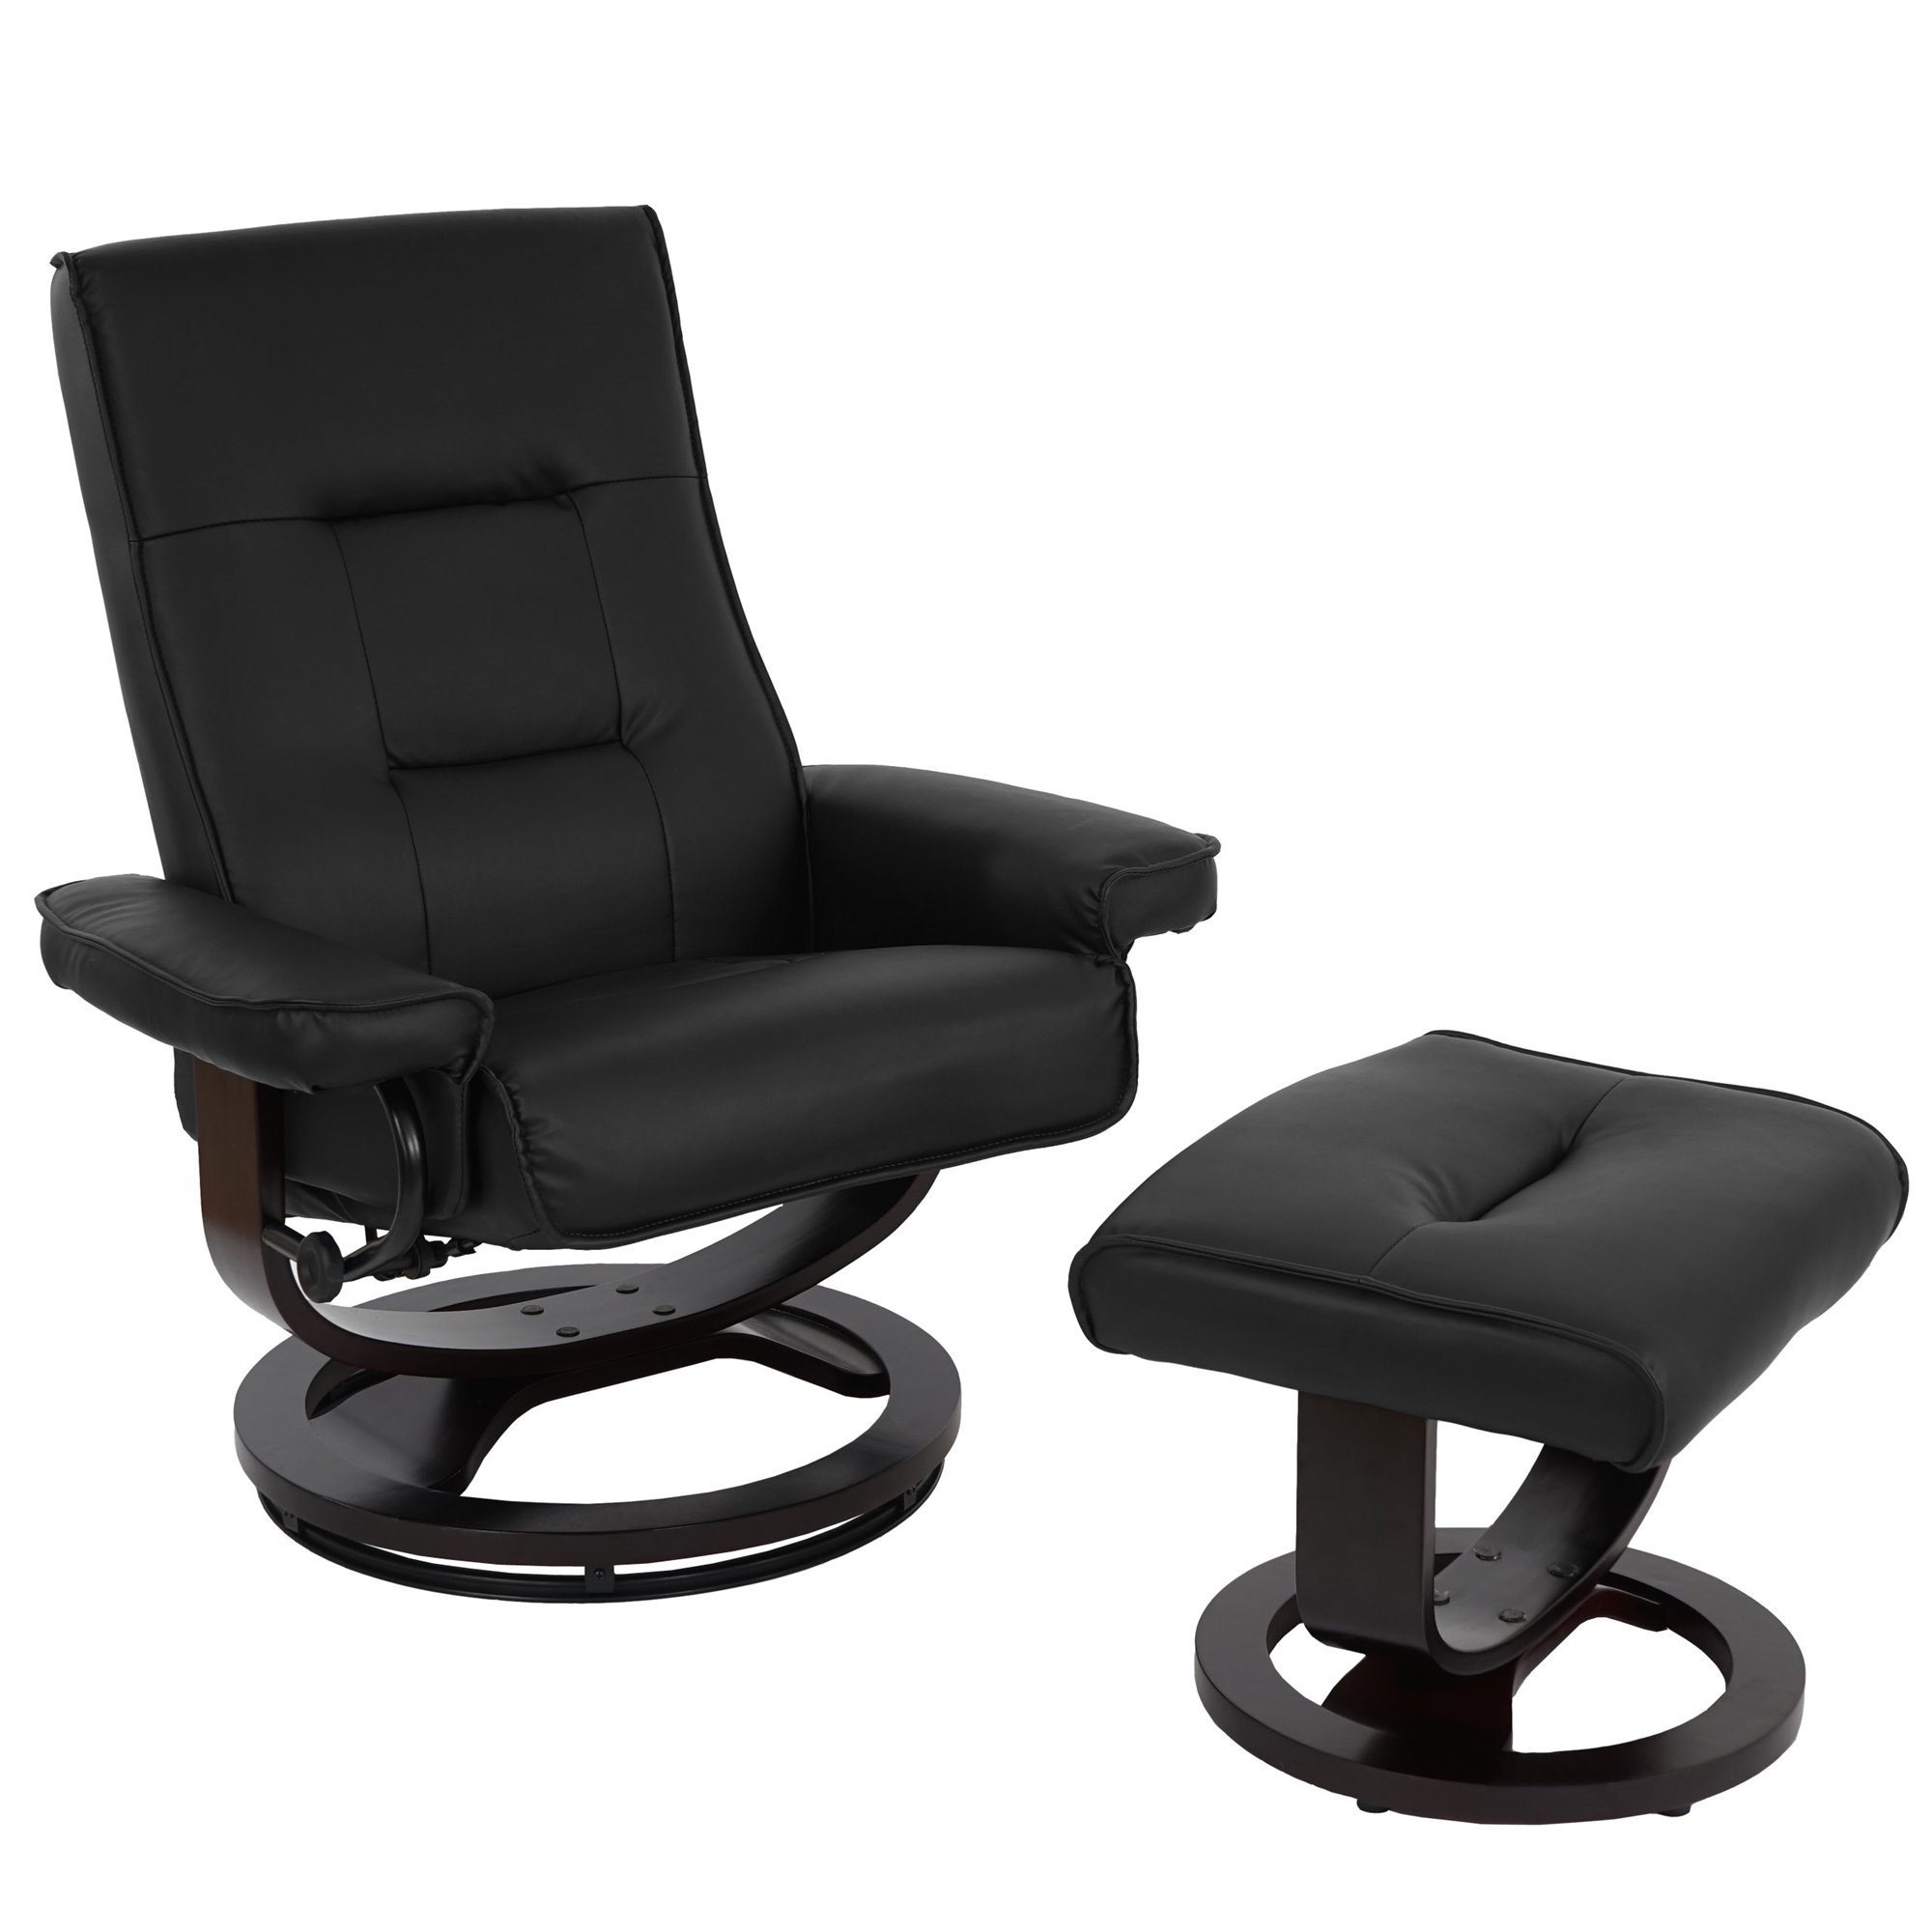 Sillon Relax Piel X8d1 Sillà N Relax Reclinable Valentino En Piel 100 Real Color Negro